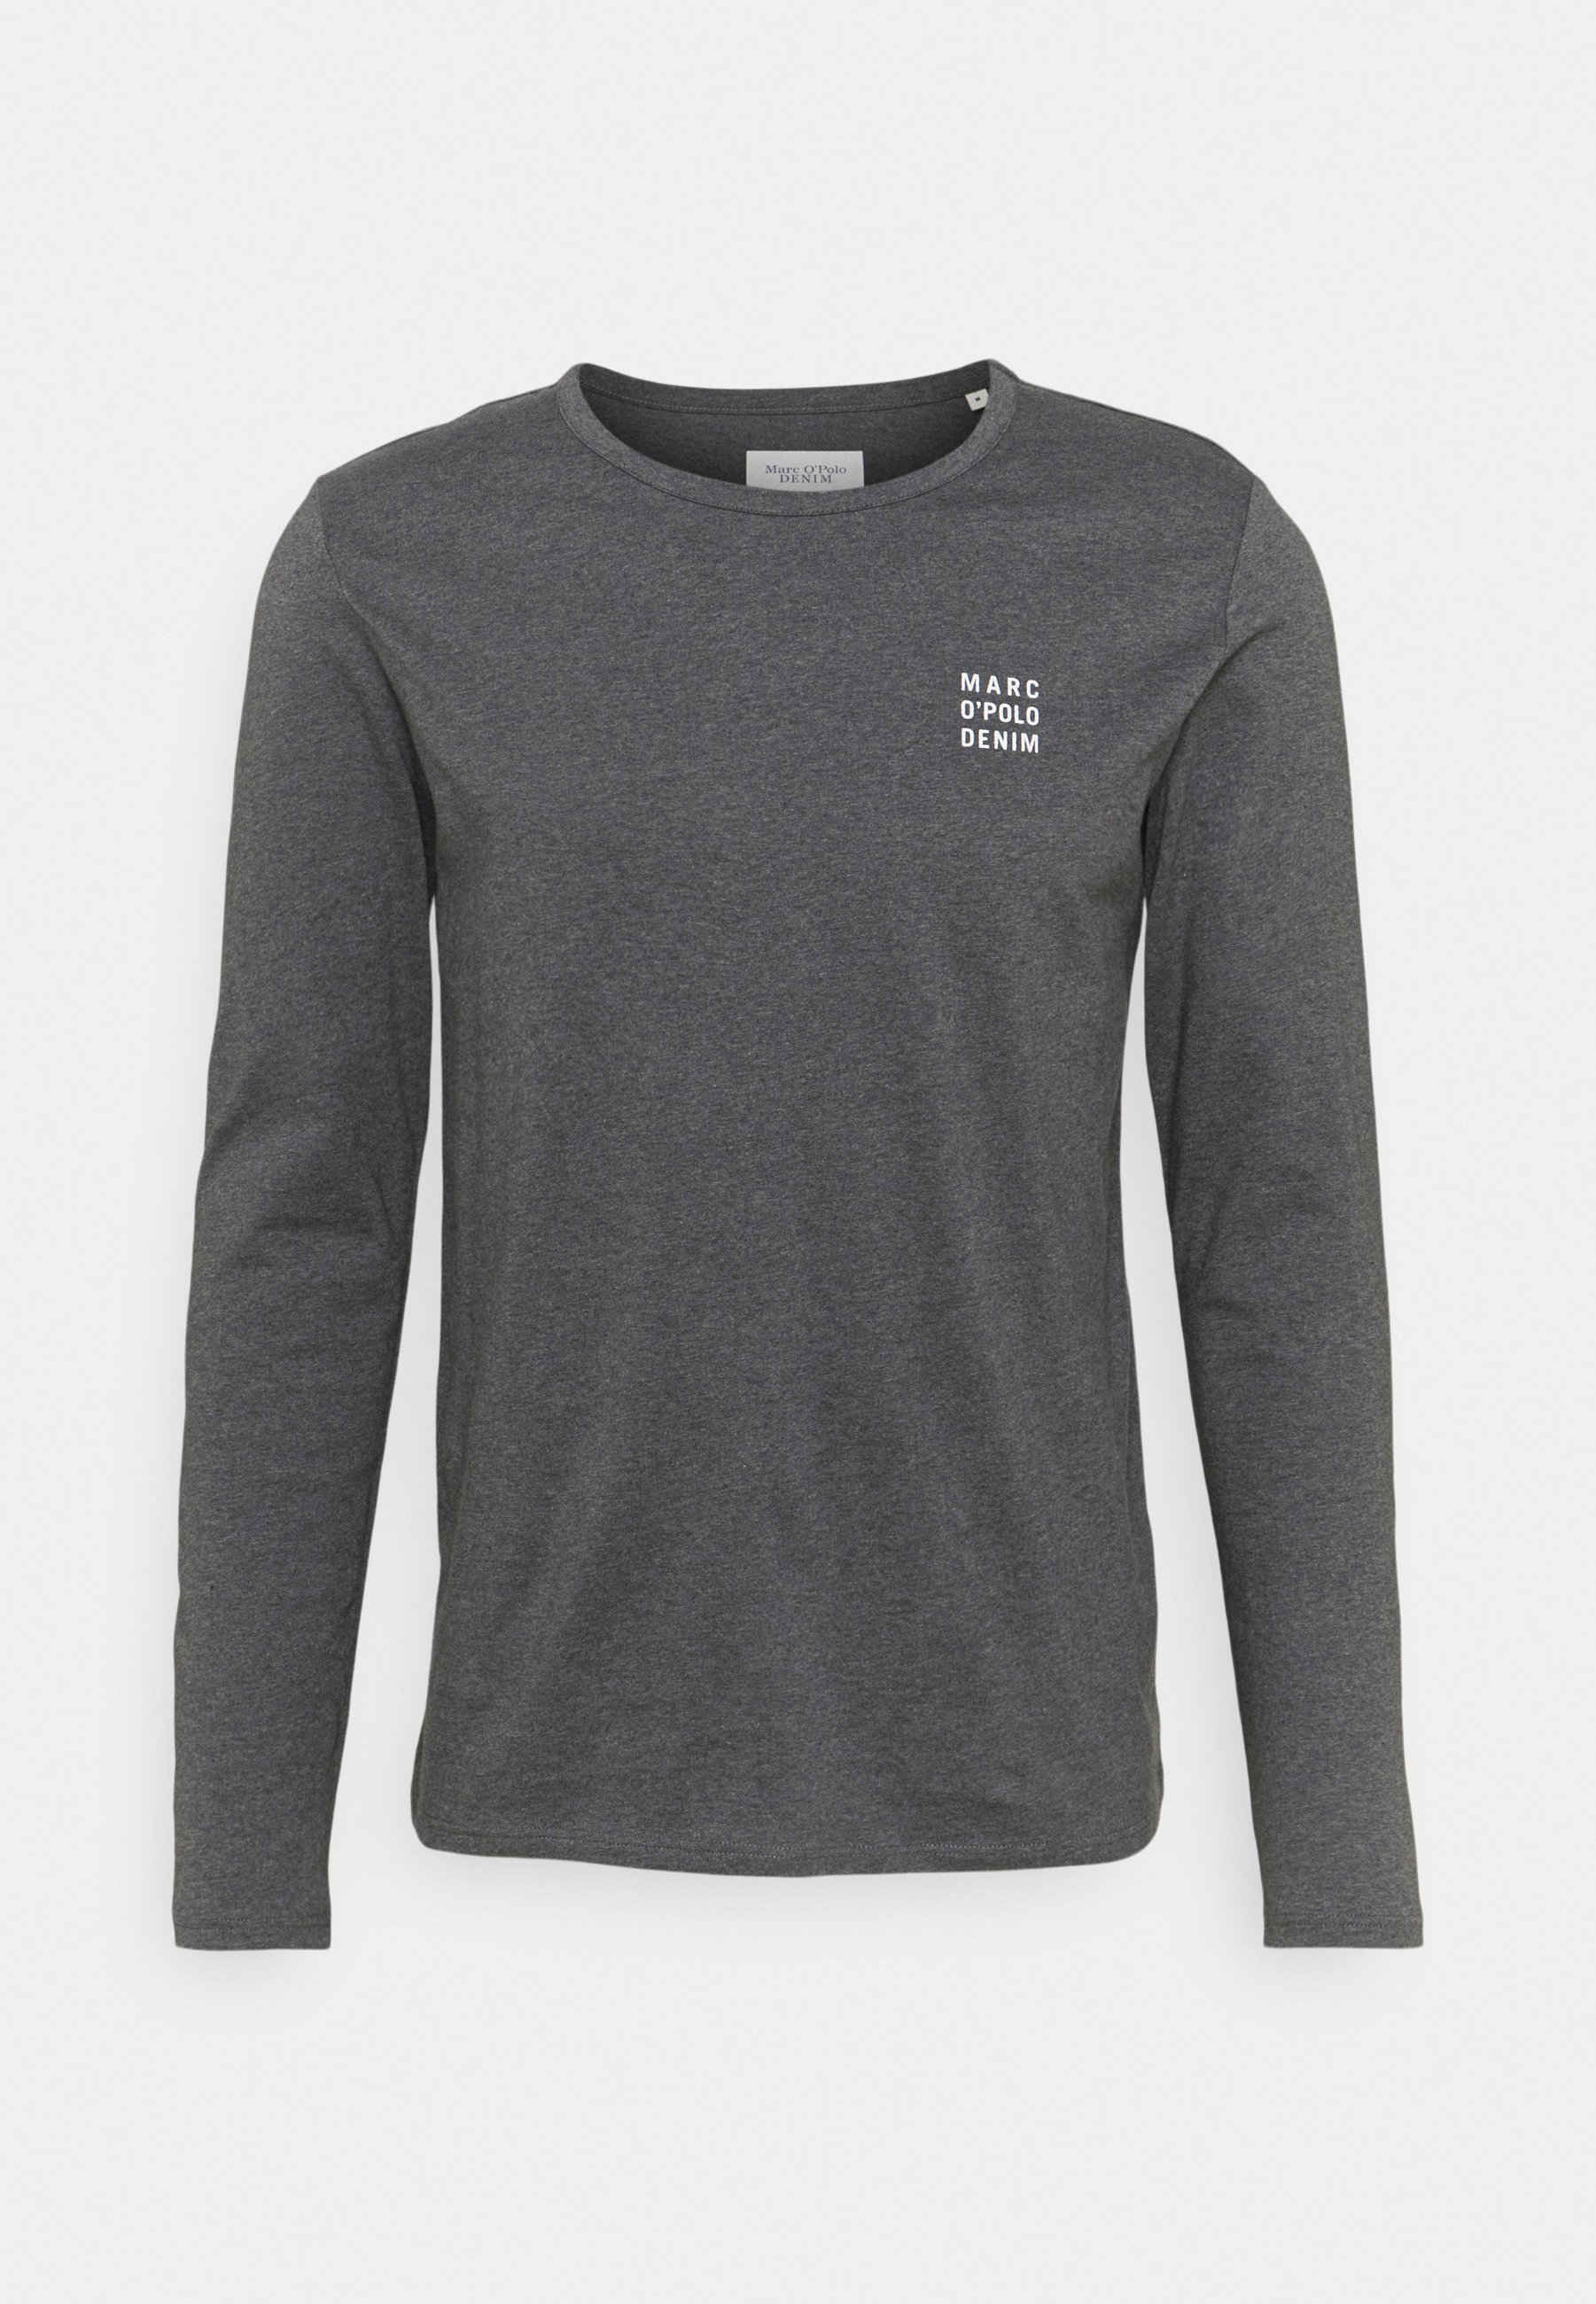 Uomo LONG SLEEVE SMALL LOGO PRINT - Maglietta a manica lunga